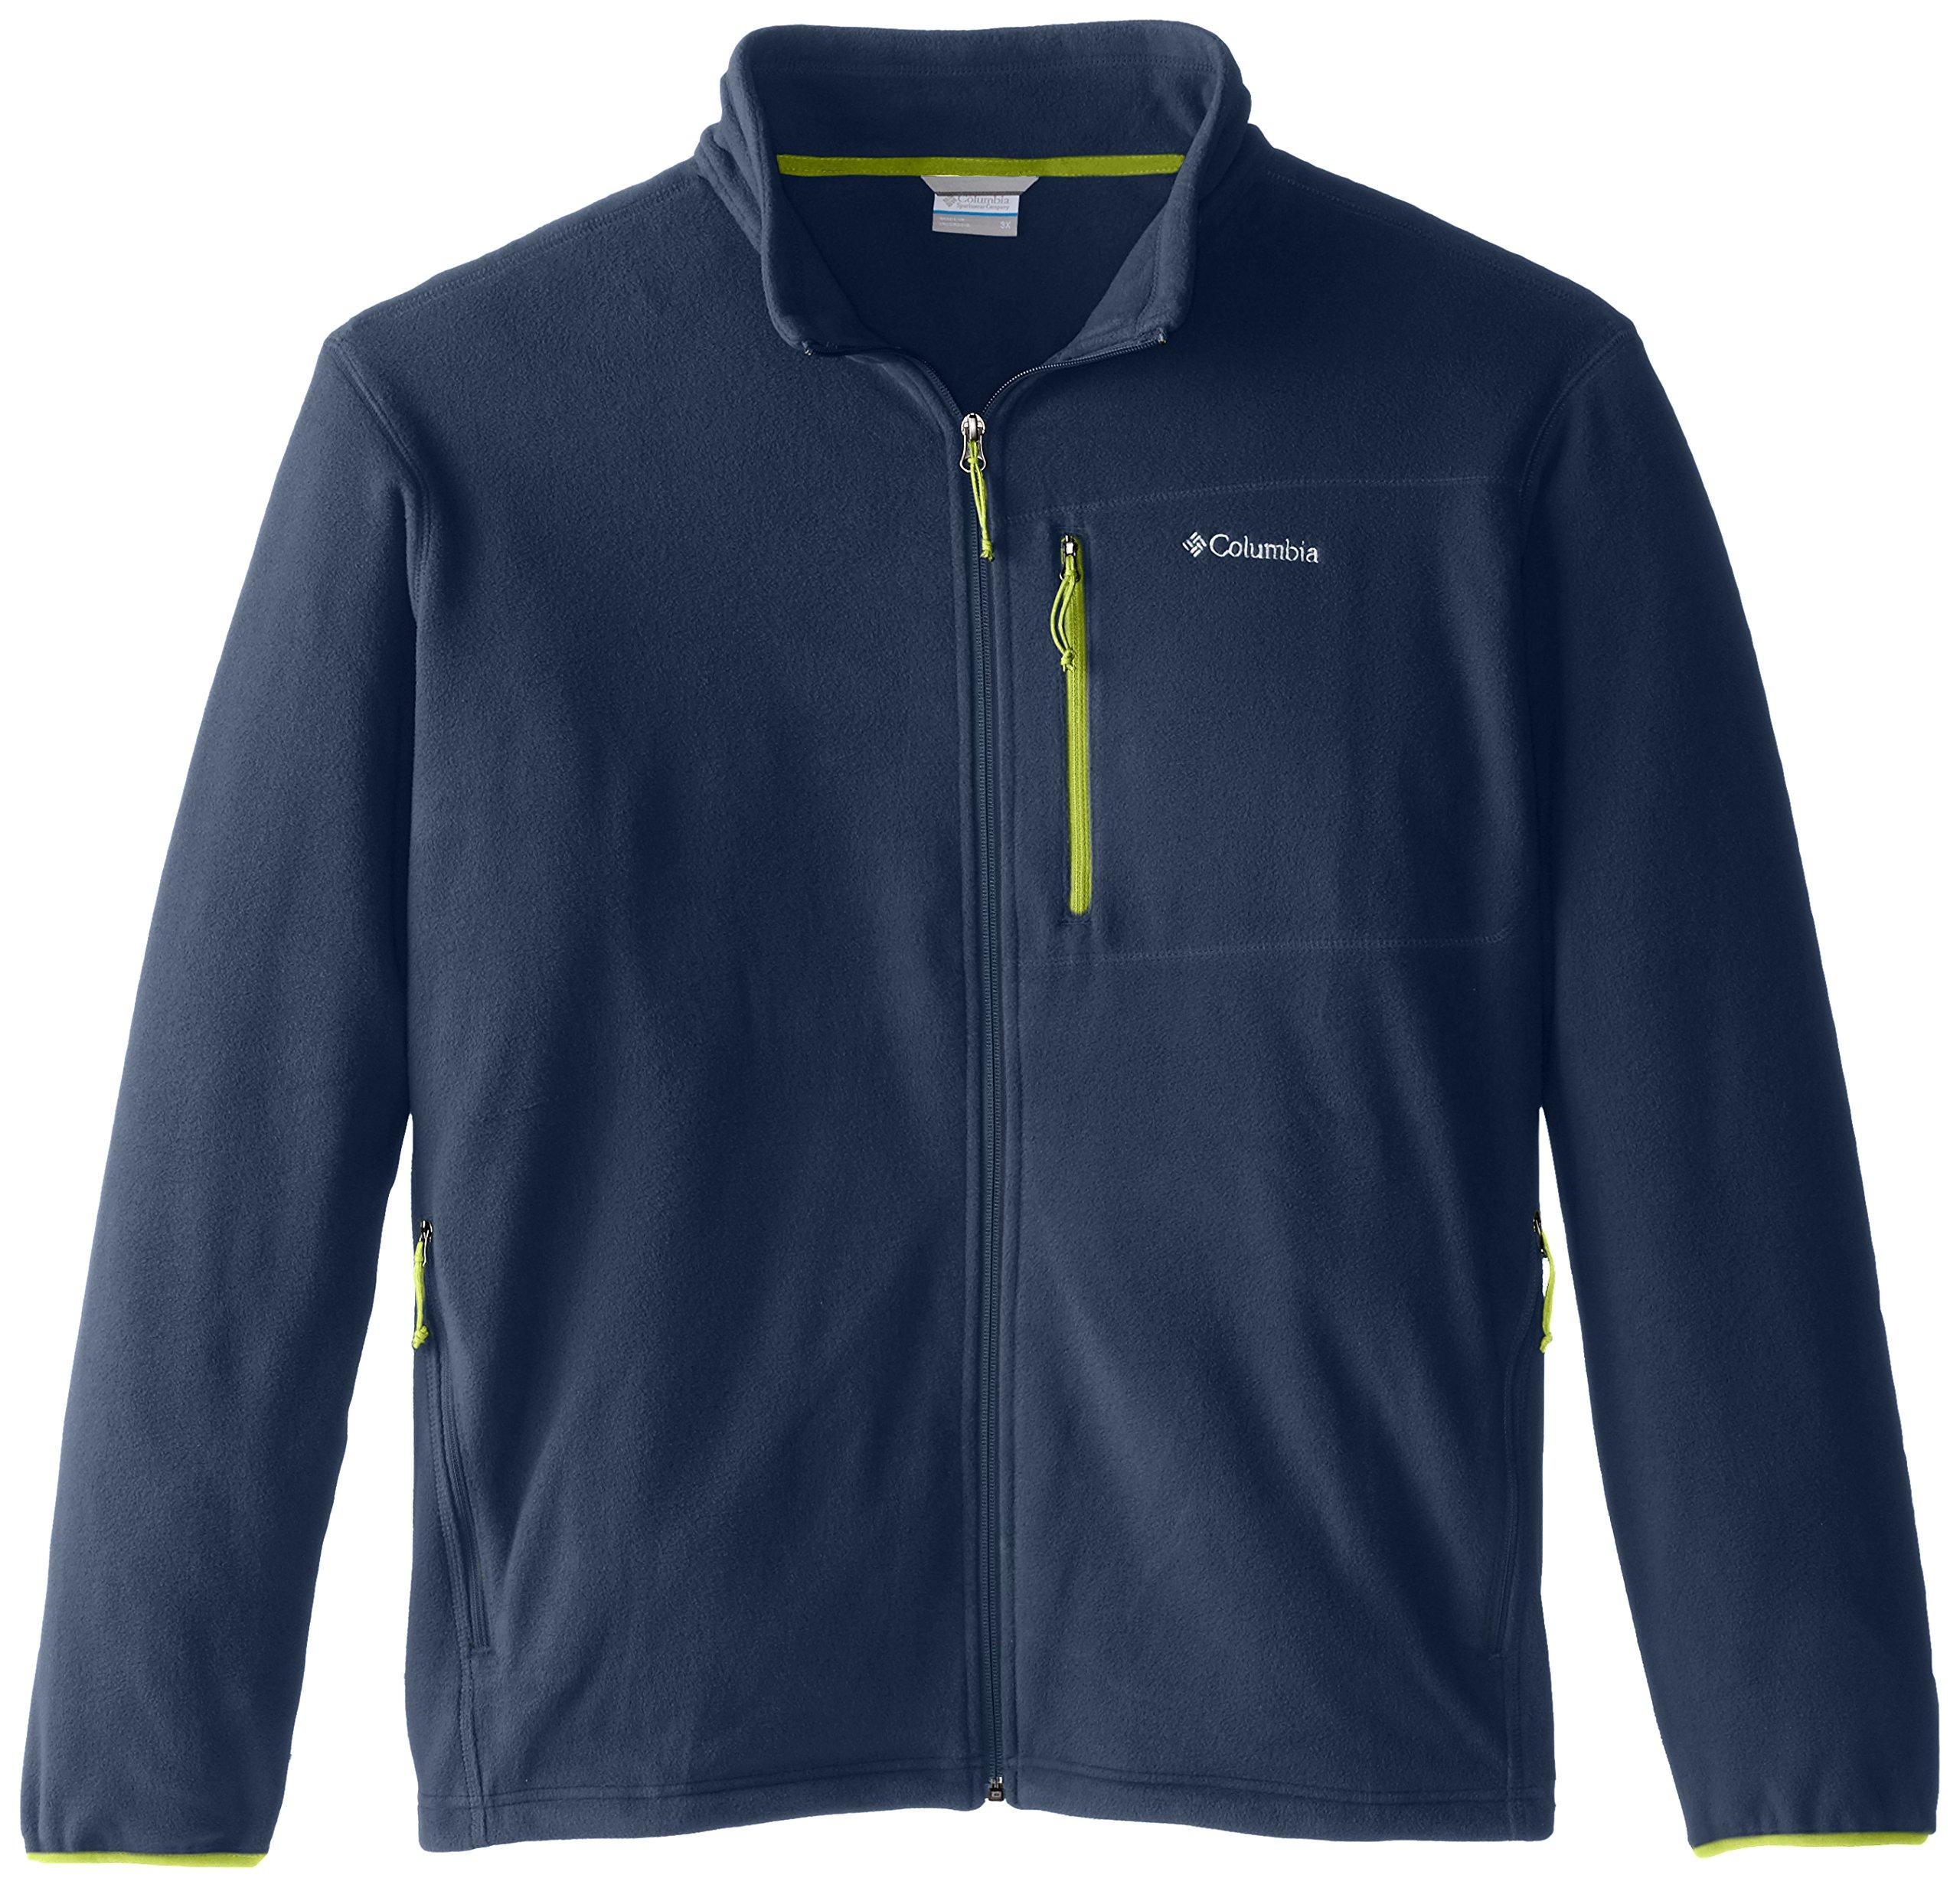 Columbia Men's Big and Tall Cascades Explorer Full Zip Midweight Fleece Jacket, Zinc/Voltage, Large/Tall